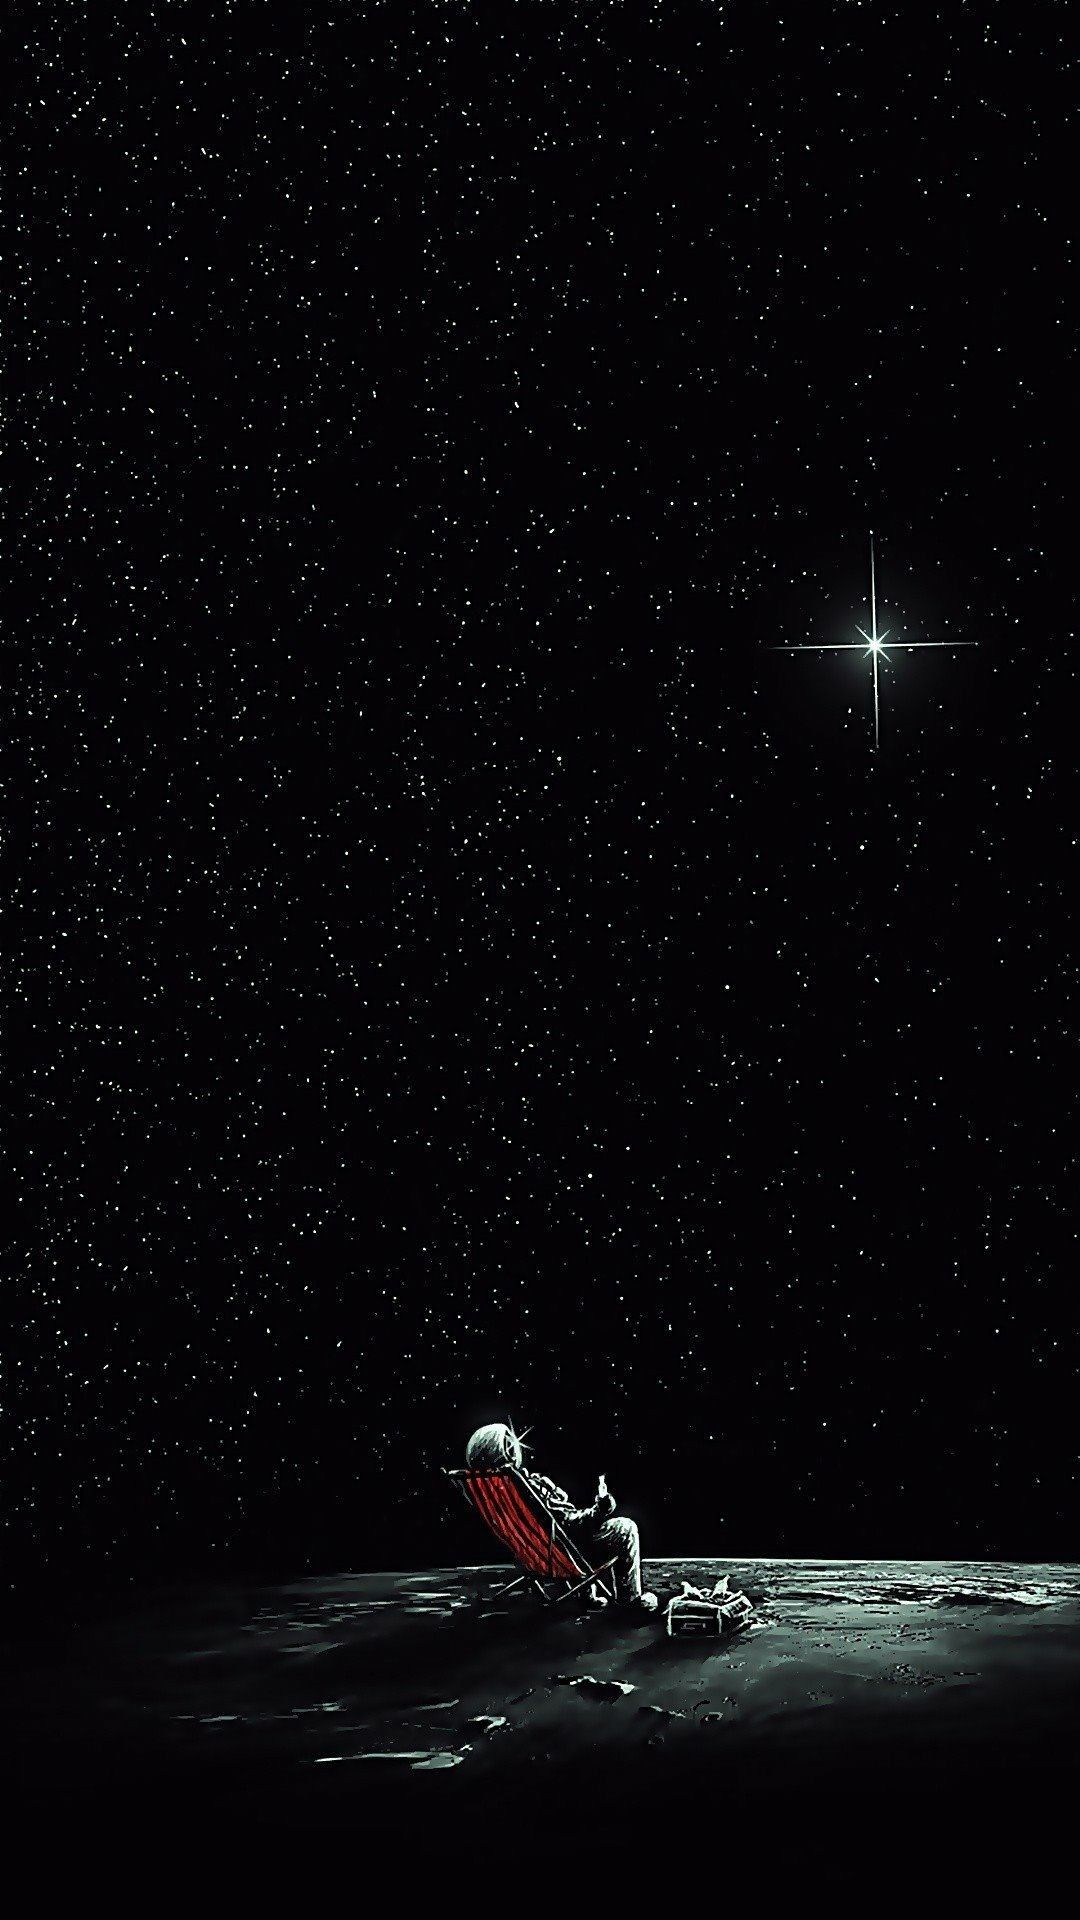 Best Of Surreal Phone Wallpapers Wallpaper Space Astronaut Wallpaper Dark Wallpaper